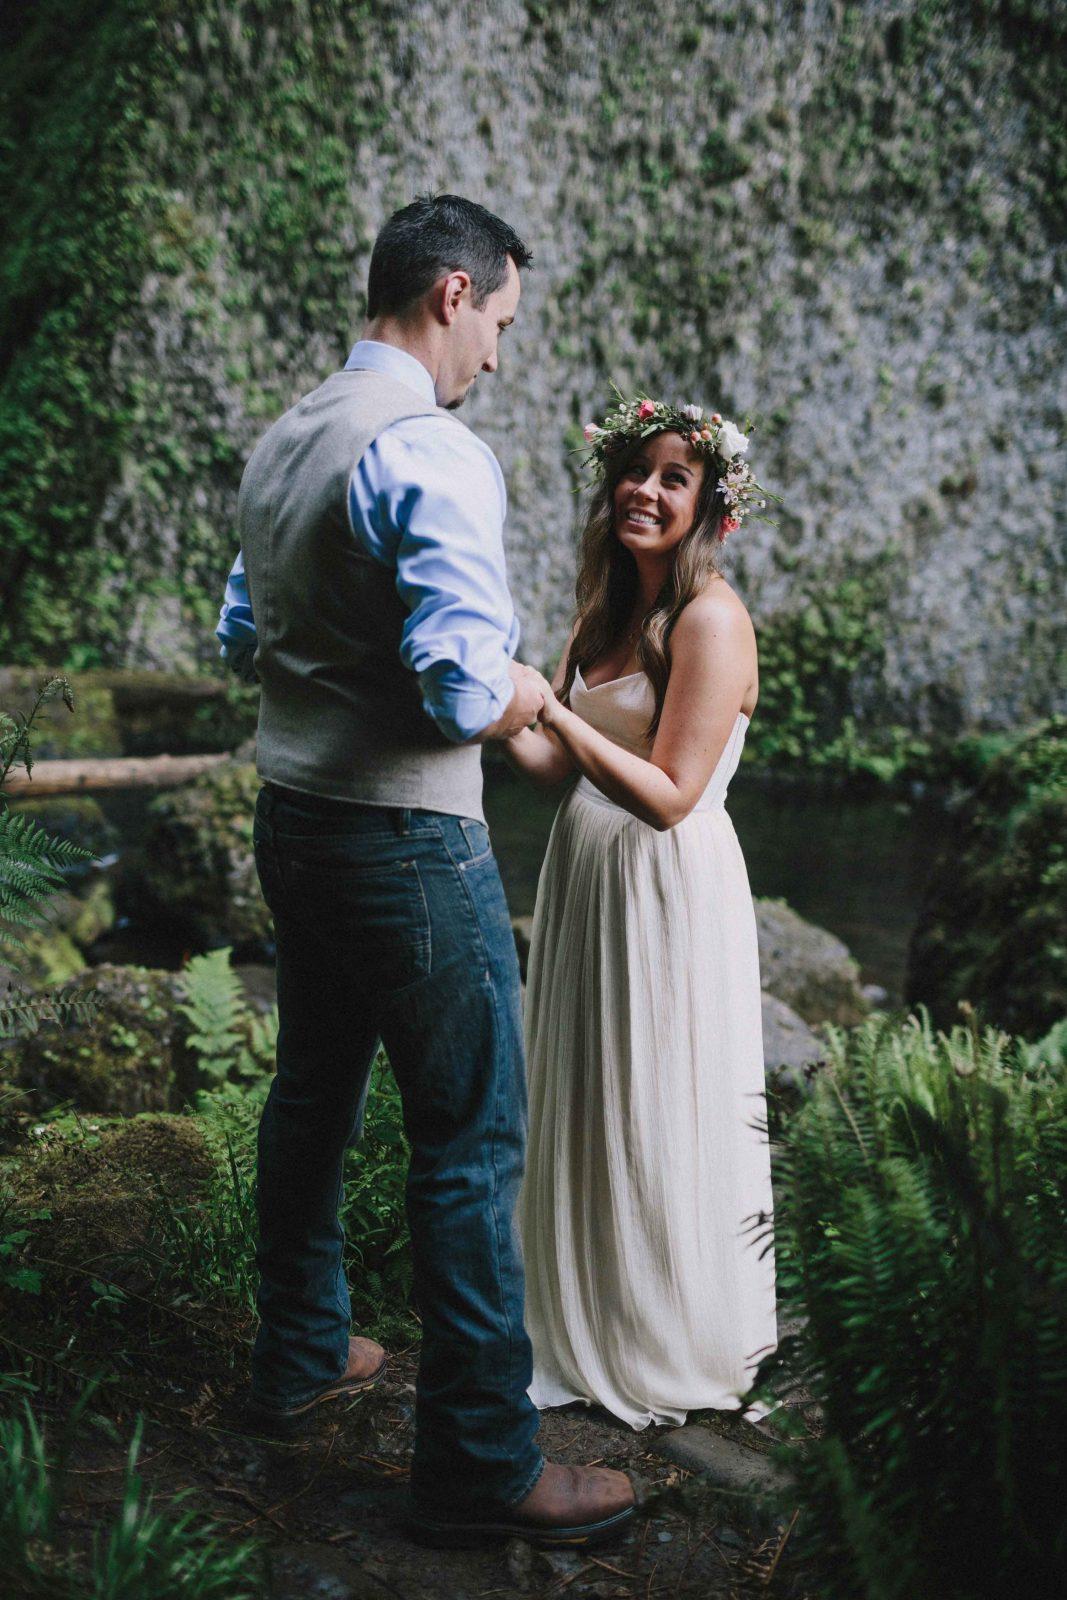 amber&andrew, wedding waterfall, wedding locations, dream wedding, dream dress, handmade wedding dress, custom silk wedding dress